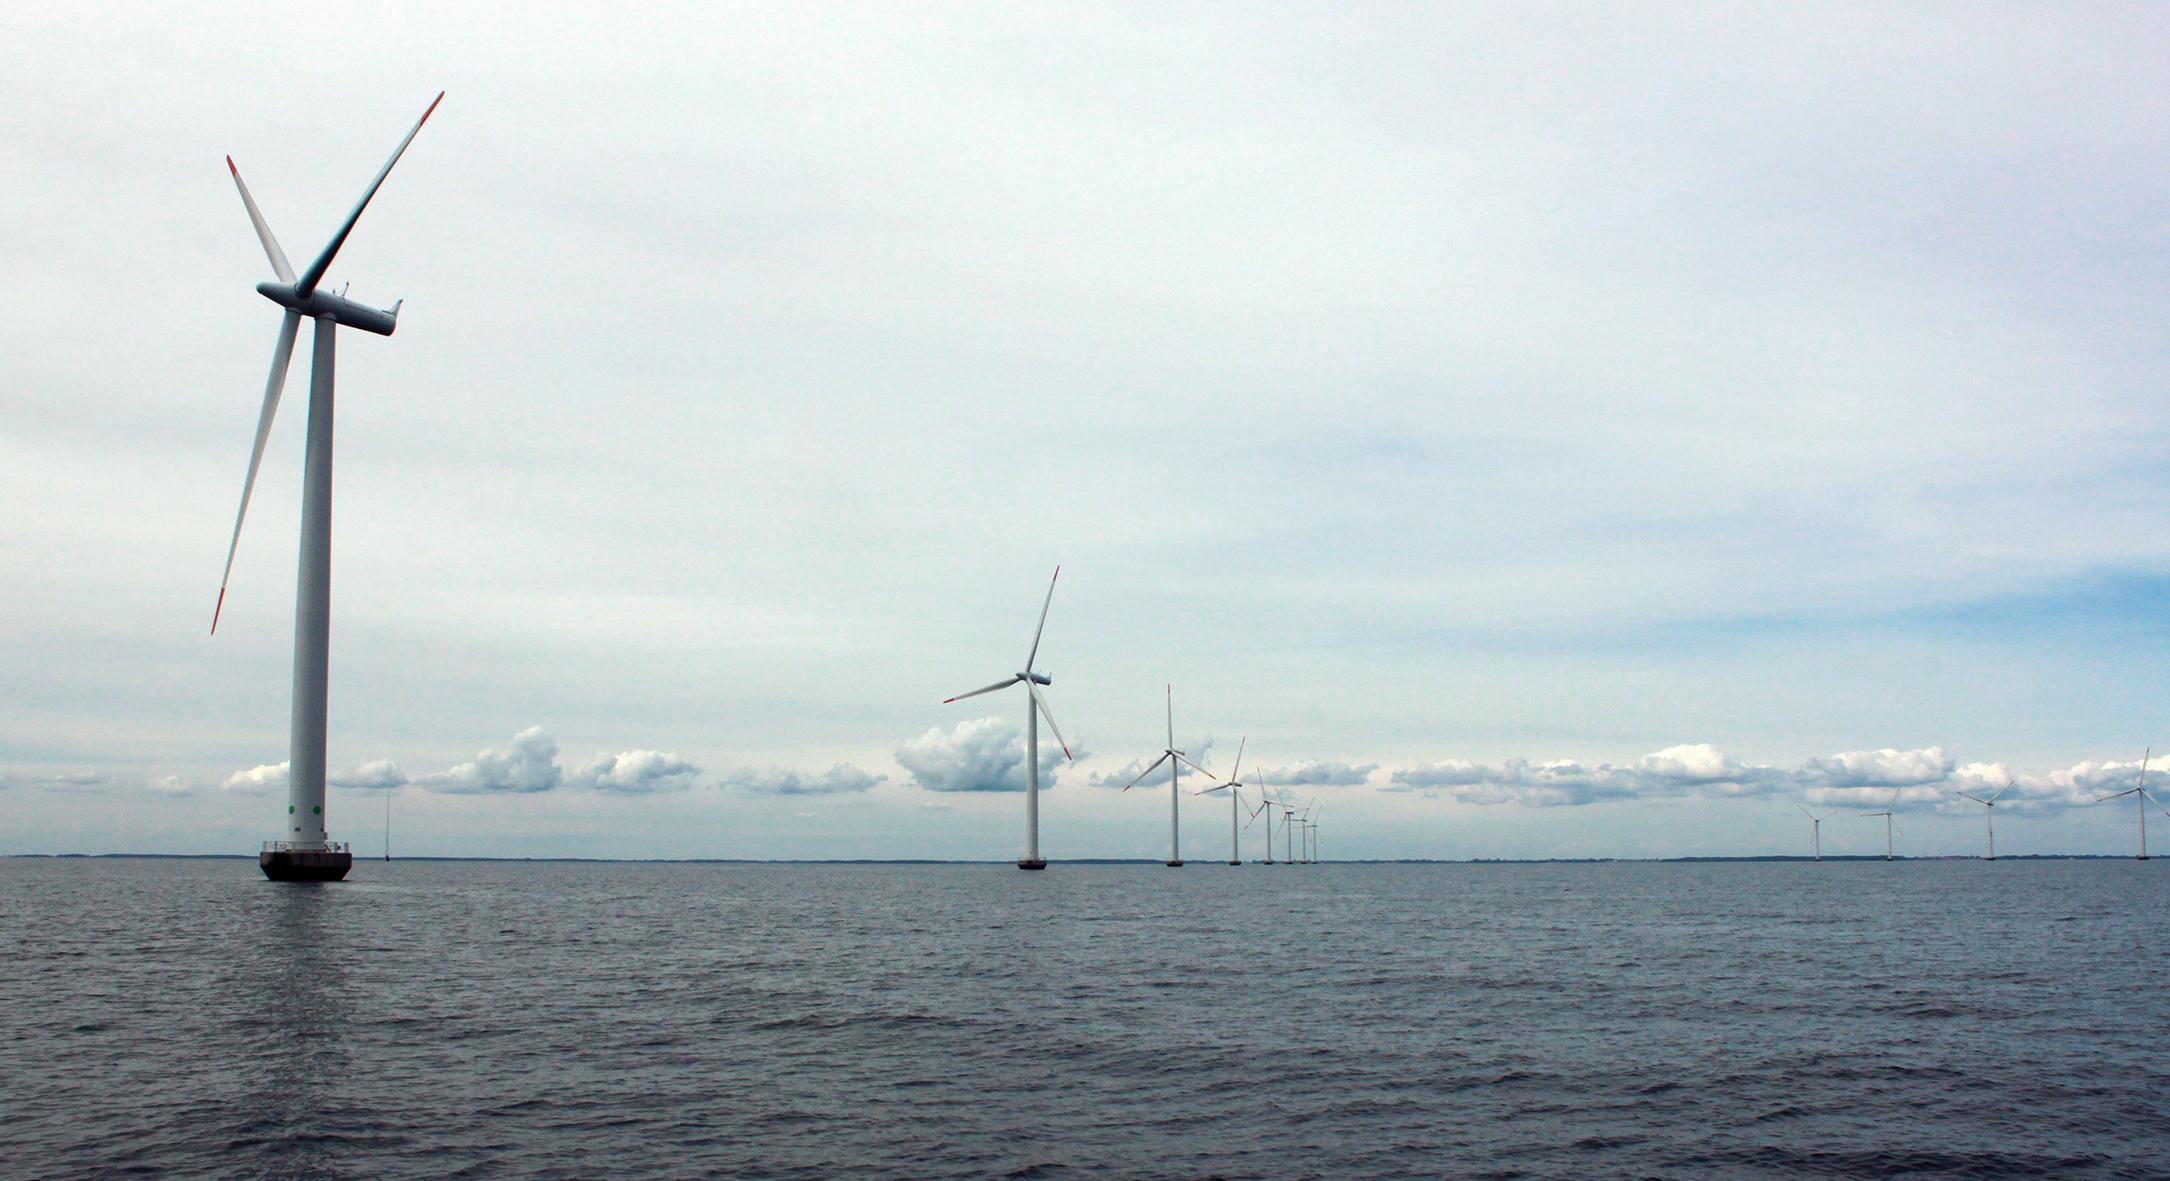 Windpark auf der Ostsee. Foto: kiraton.com